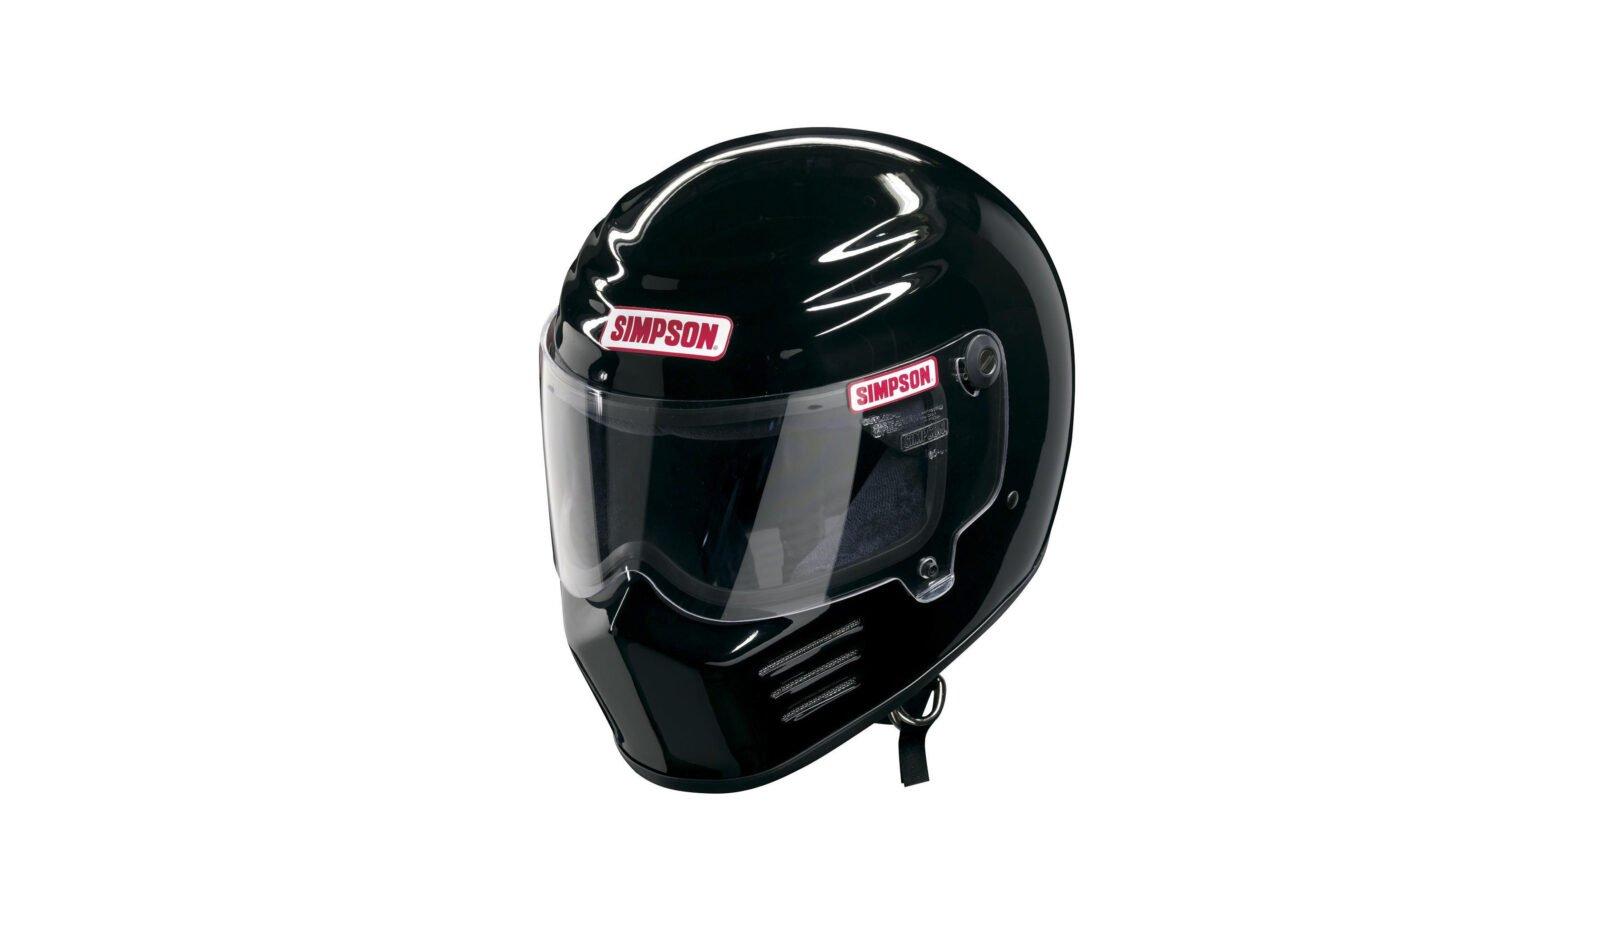 Simpson Outlaw Bandit Helmet 1600x935 - Simpson Outlaw Bandit Helmet